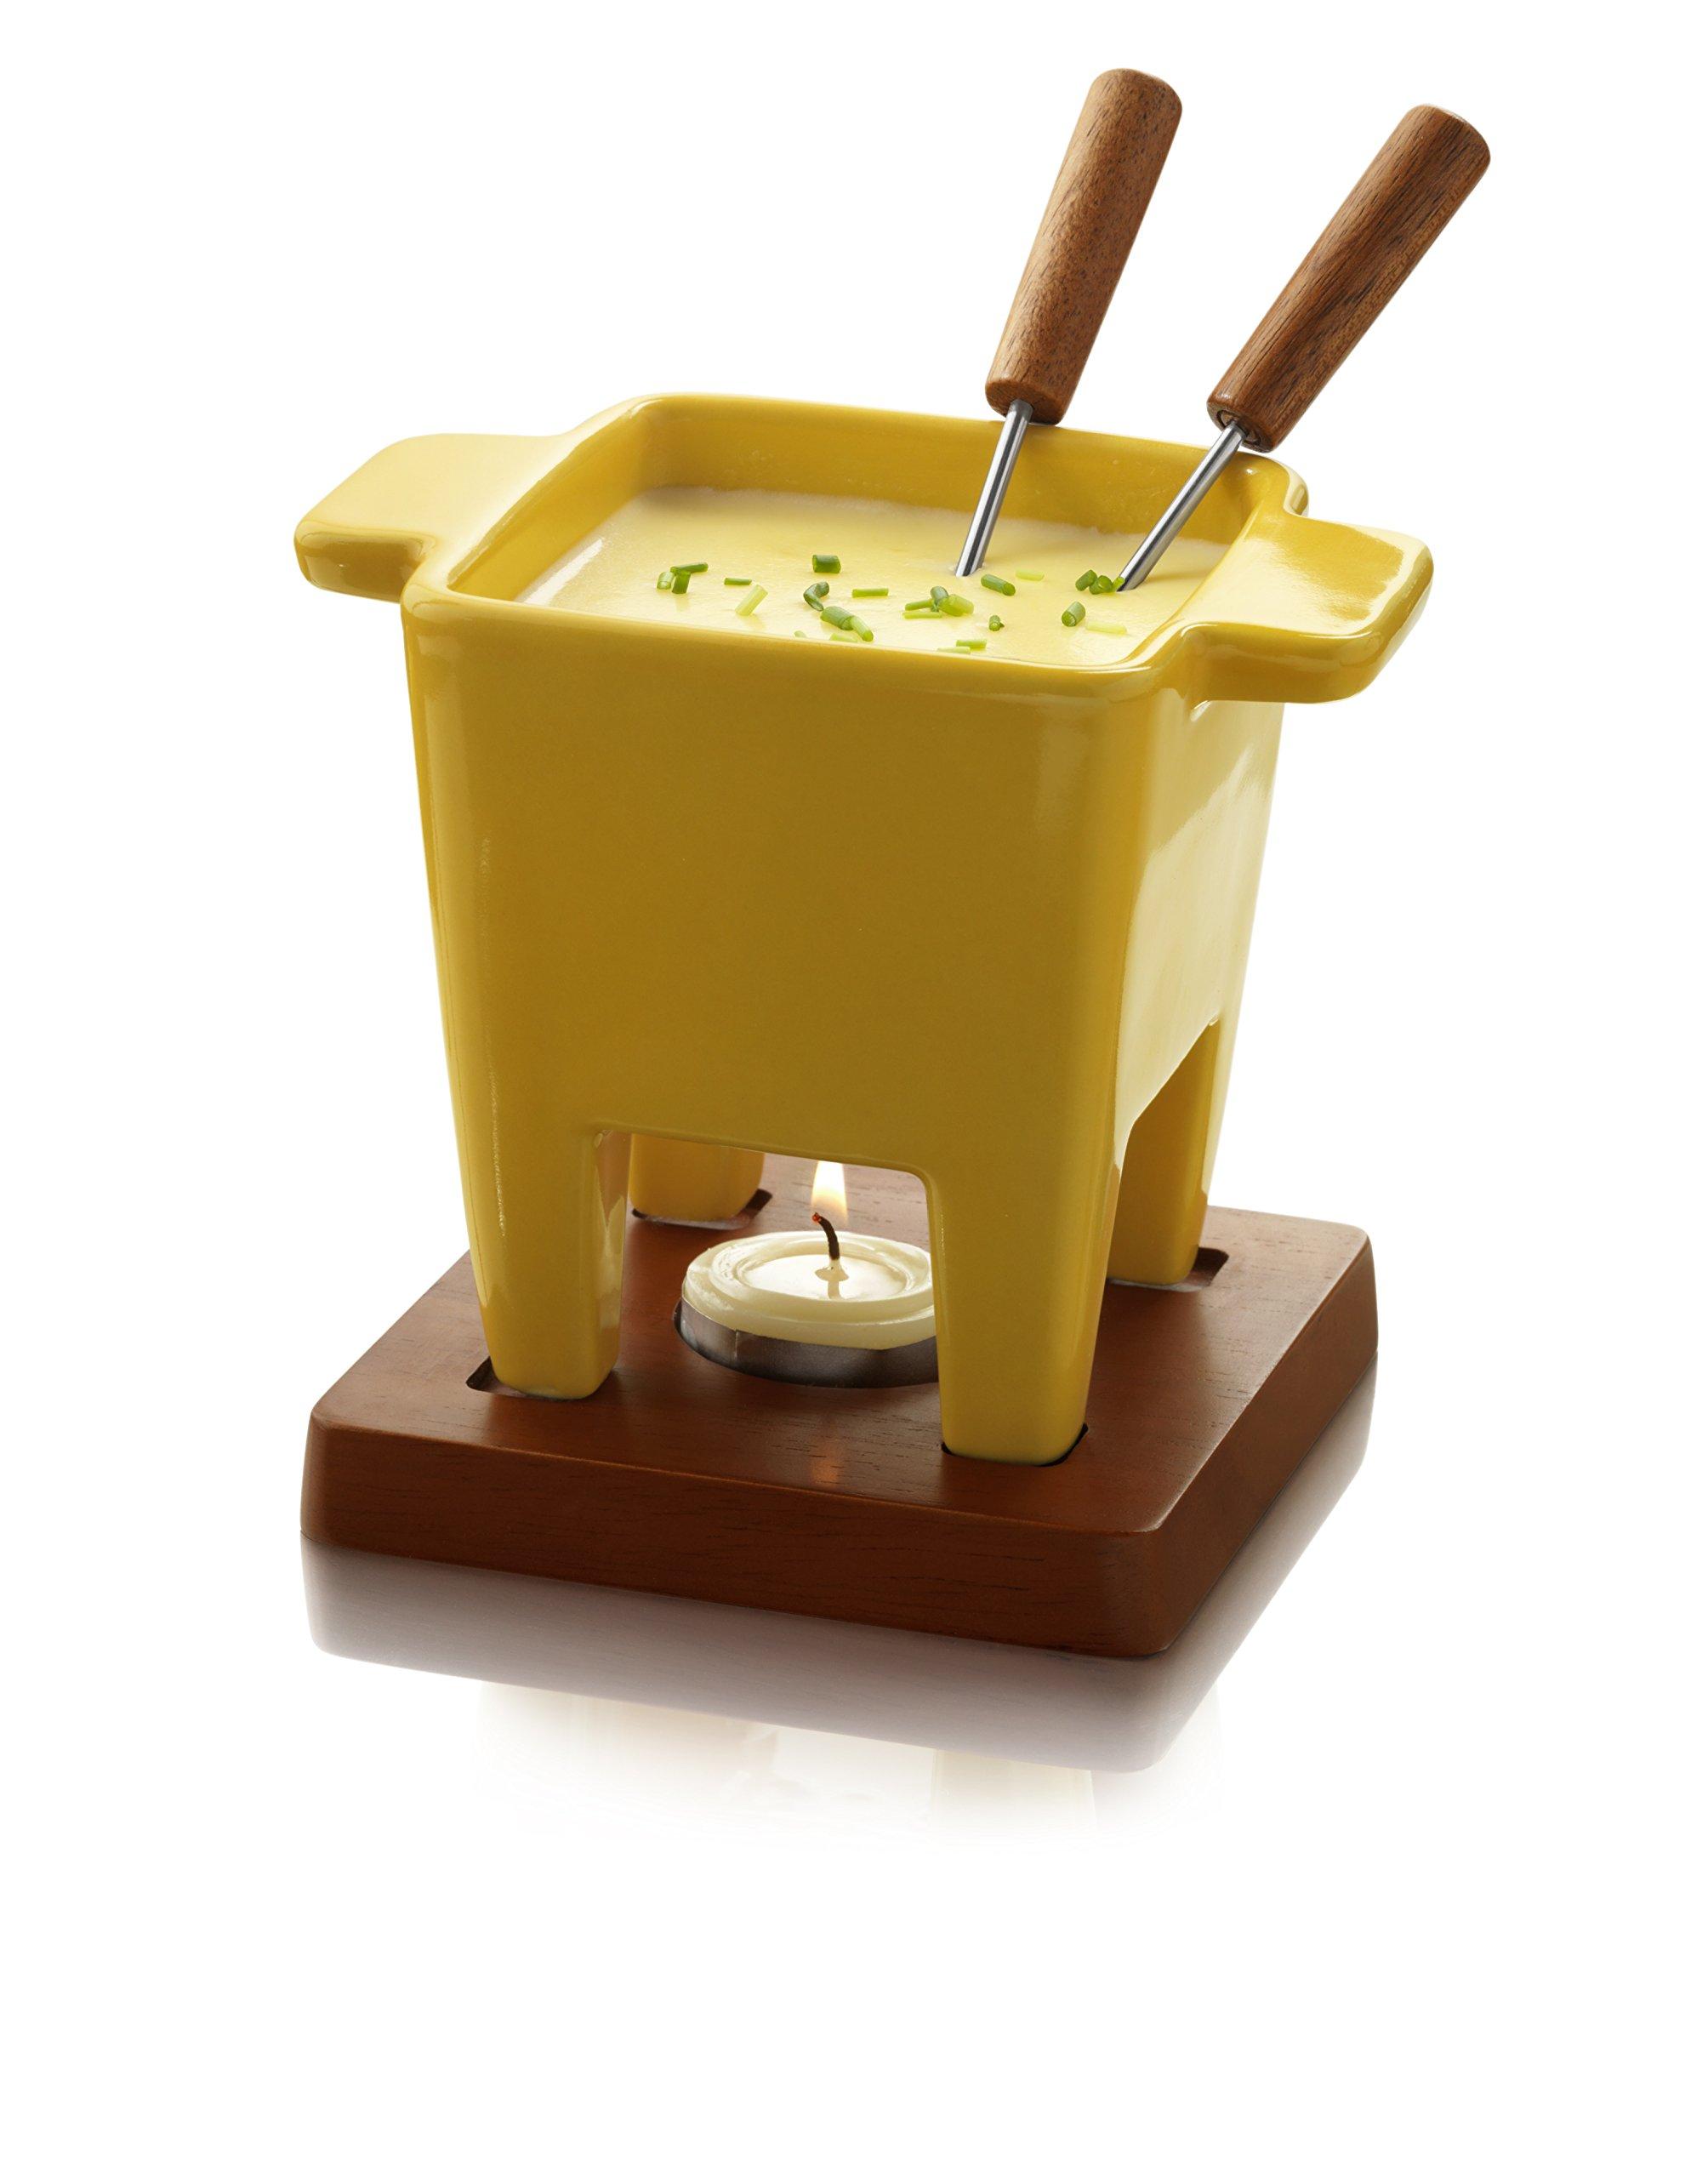 Boska Holland Tealight Fondue Set, For Cheese or Chocolate, Tapas, 200 mL, Yellow, Dutch Collection